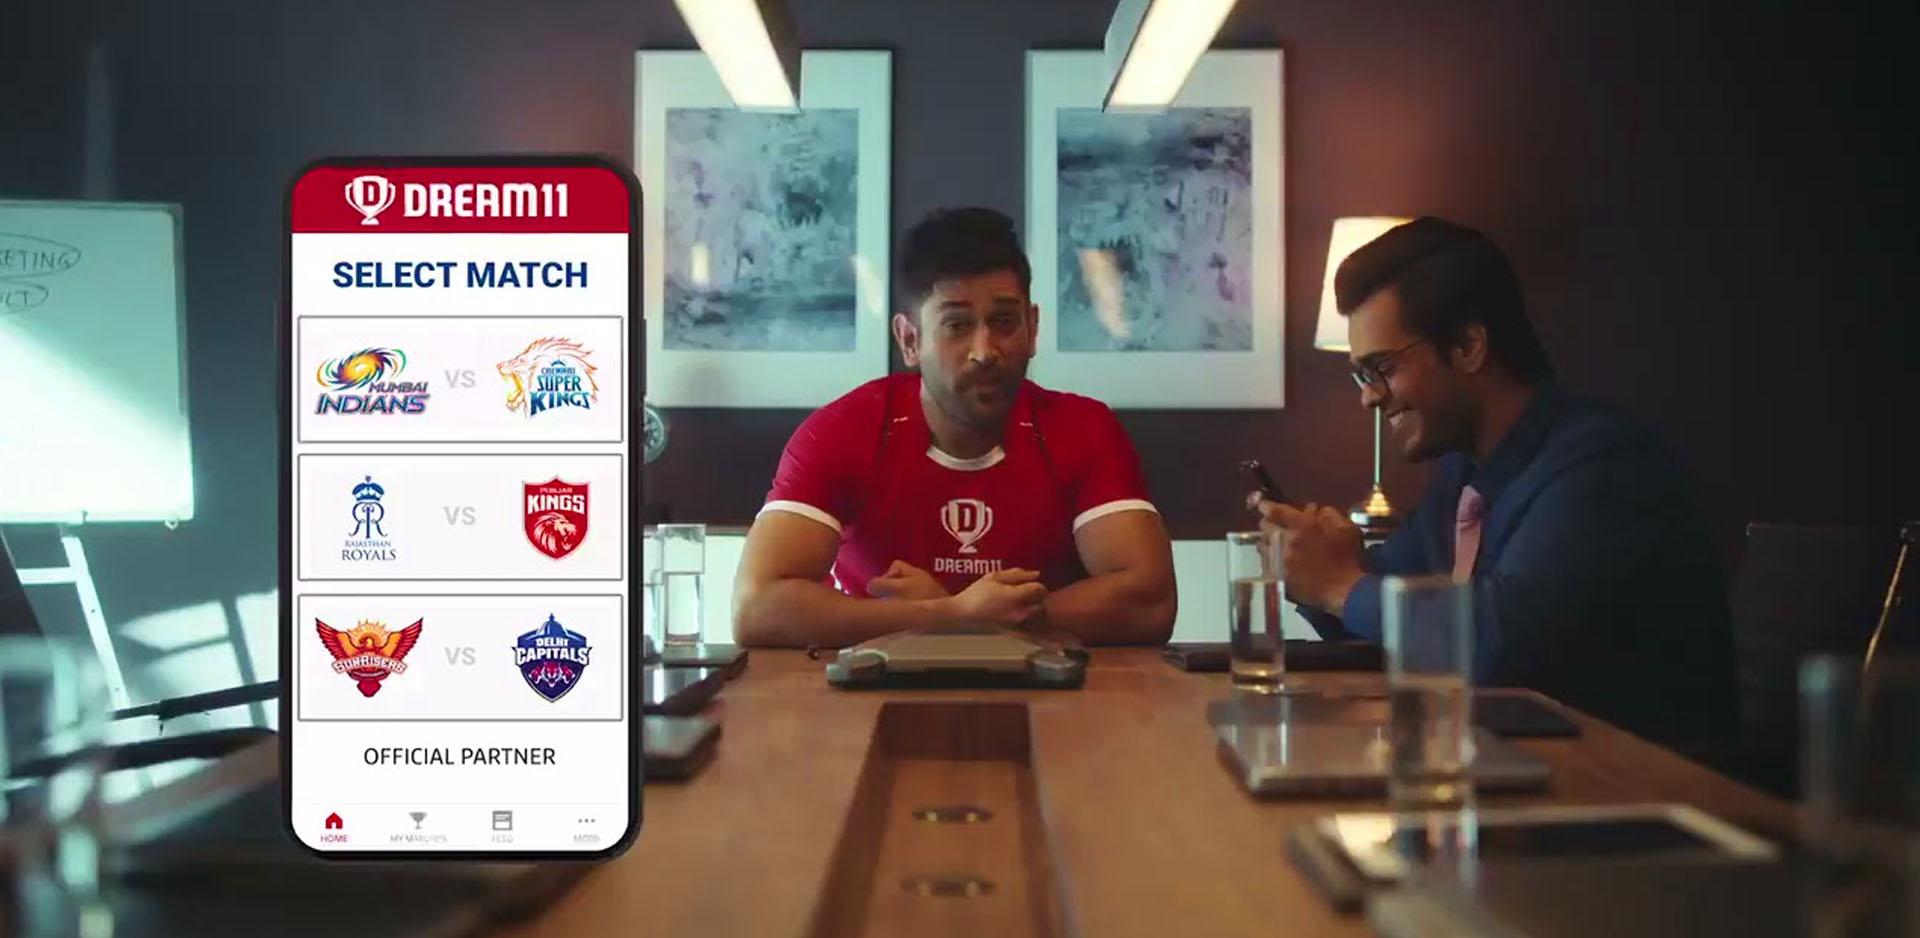 Dreatop m11 India's fantasy gaming platform